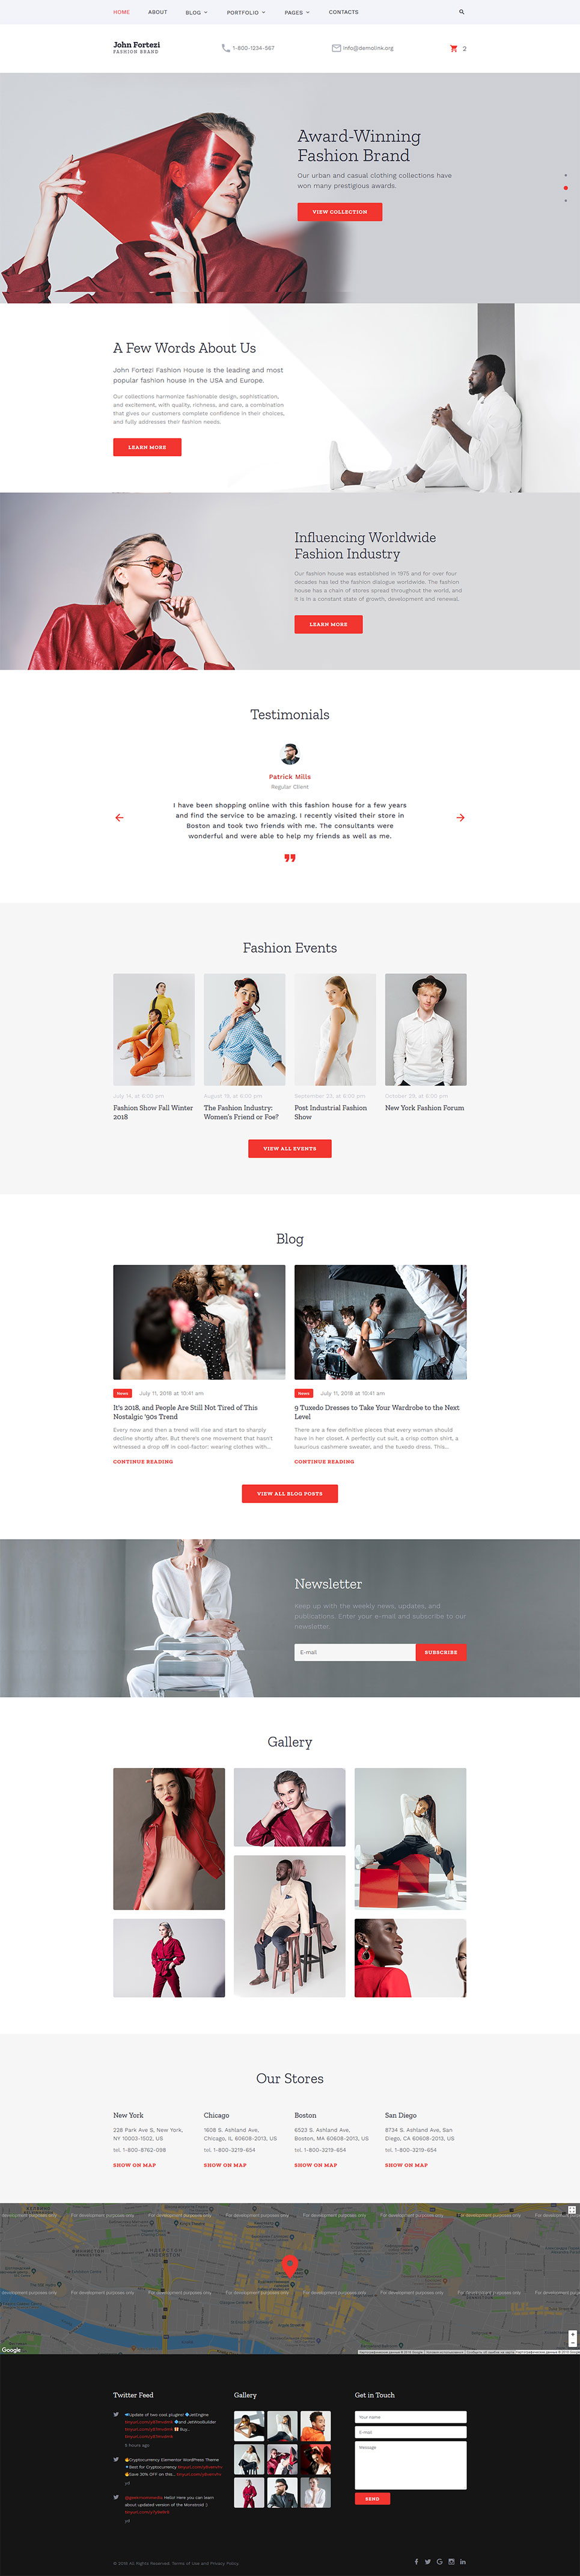 Online fashion design websites